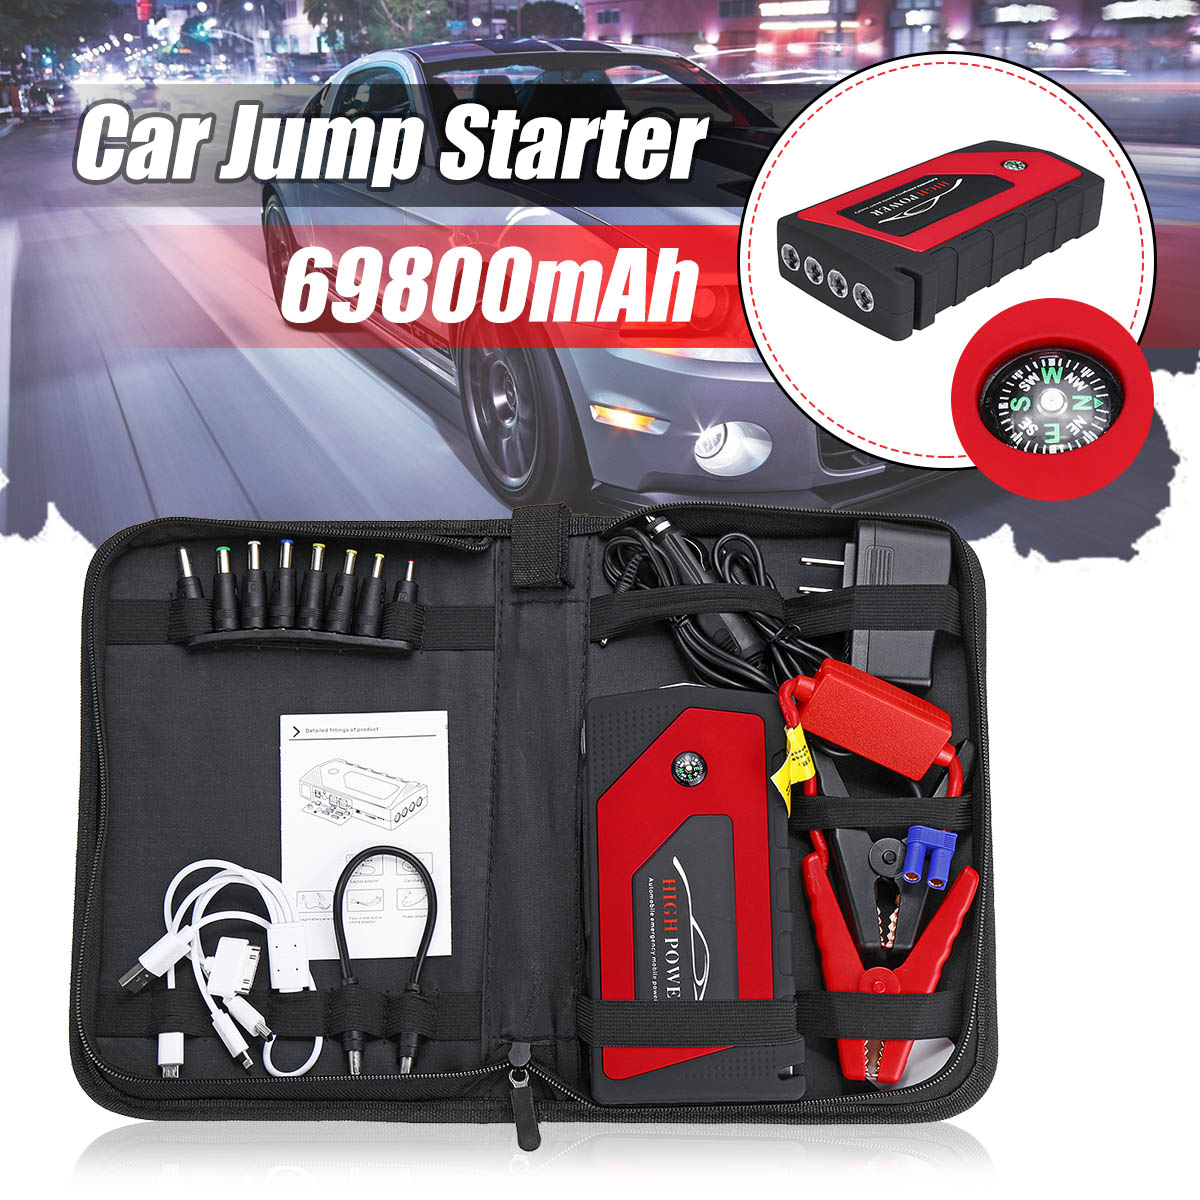 69800mAh 4 USB Car Jump Starter Pack Portable Charger Booster Power Bank Battery82800mAh 4 USB Car J